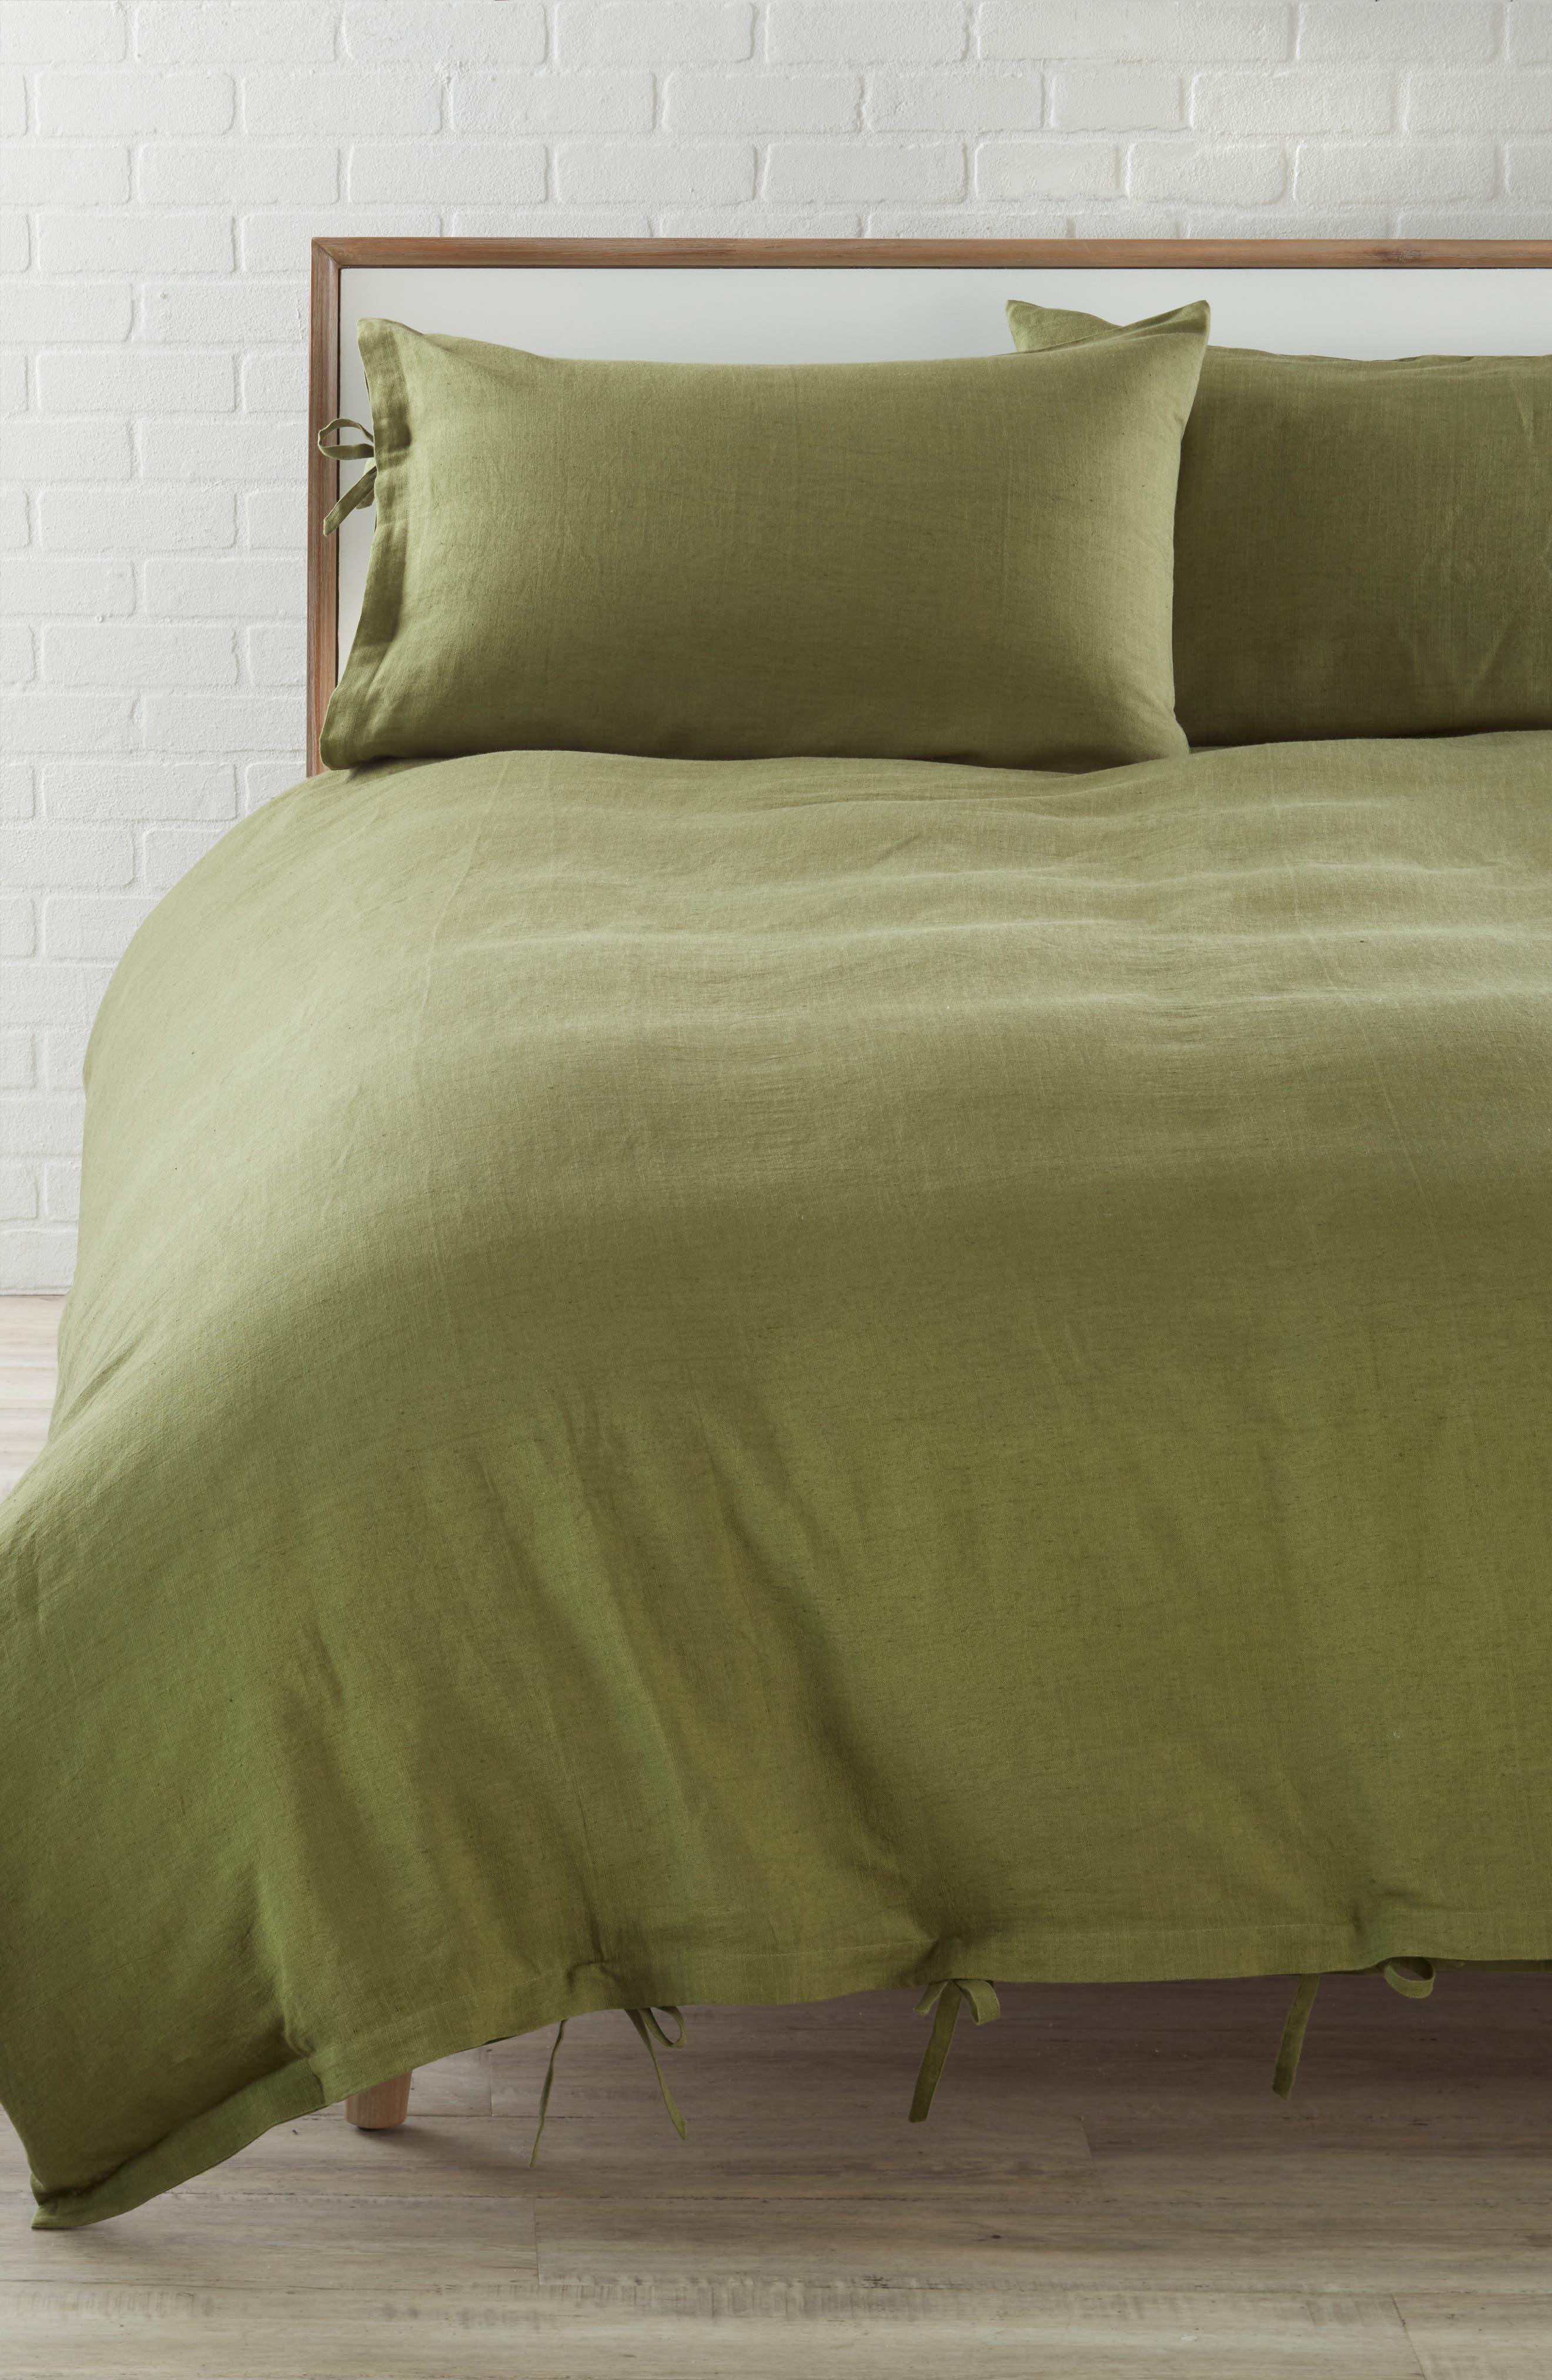 TREASURE & BOND, Relaxed Cotton & Linen Duvet Cover, Main thumbnail 1, color, OLIVE SPICE